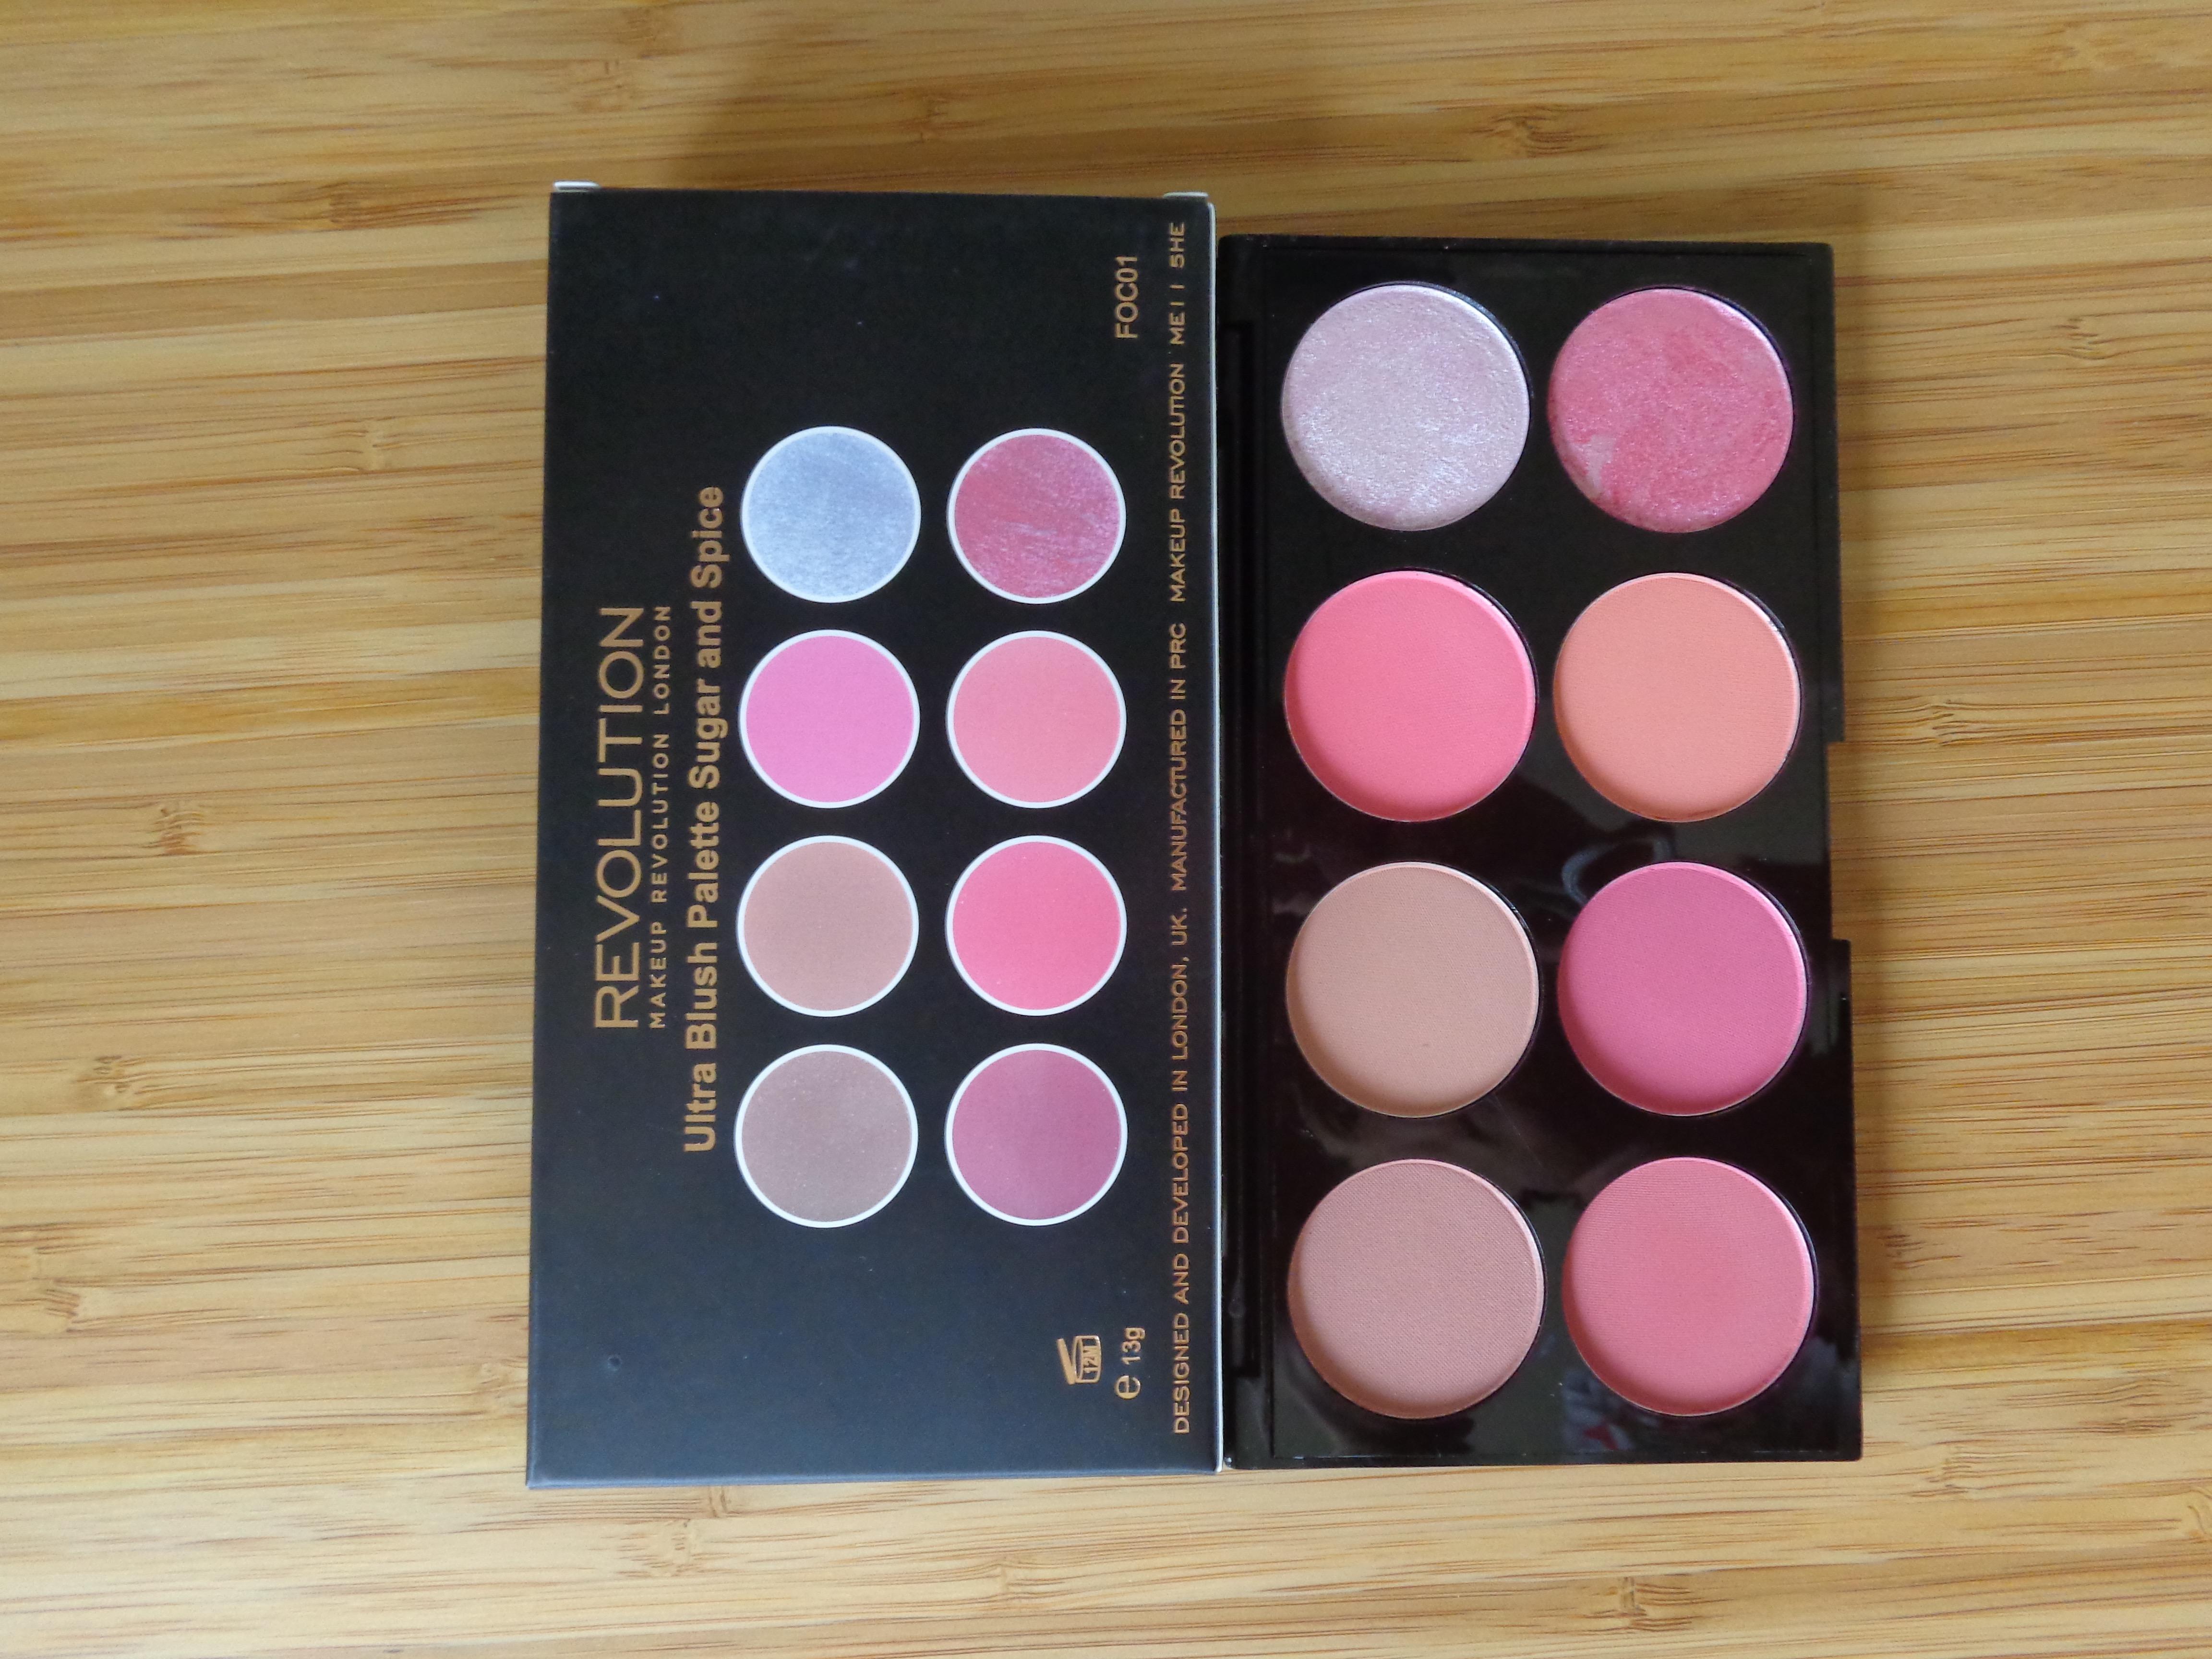 Makeup Revolution: Sugar and Spice Blush Palette